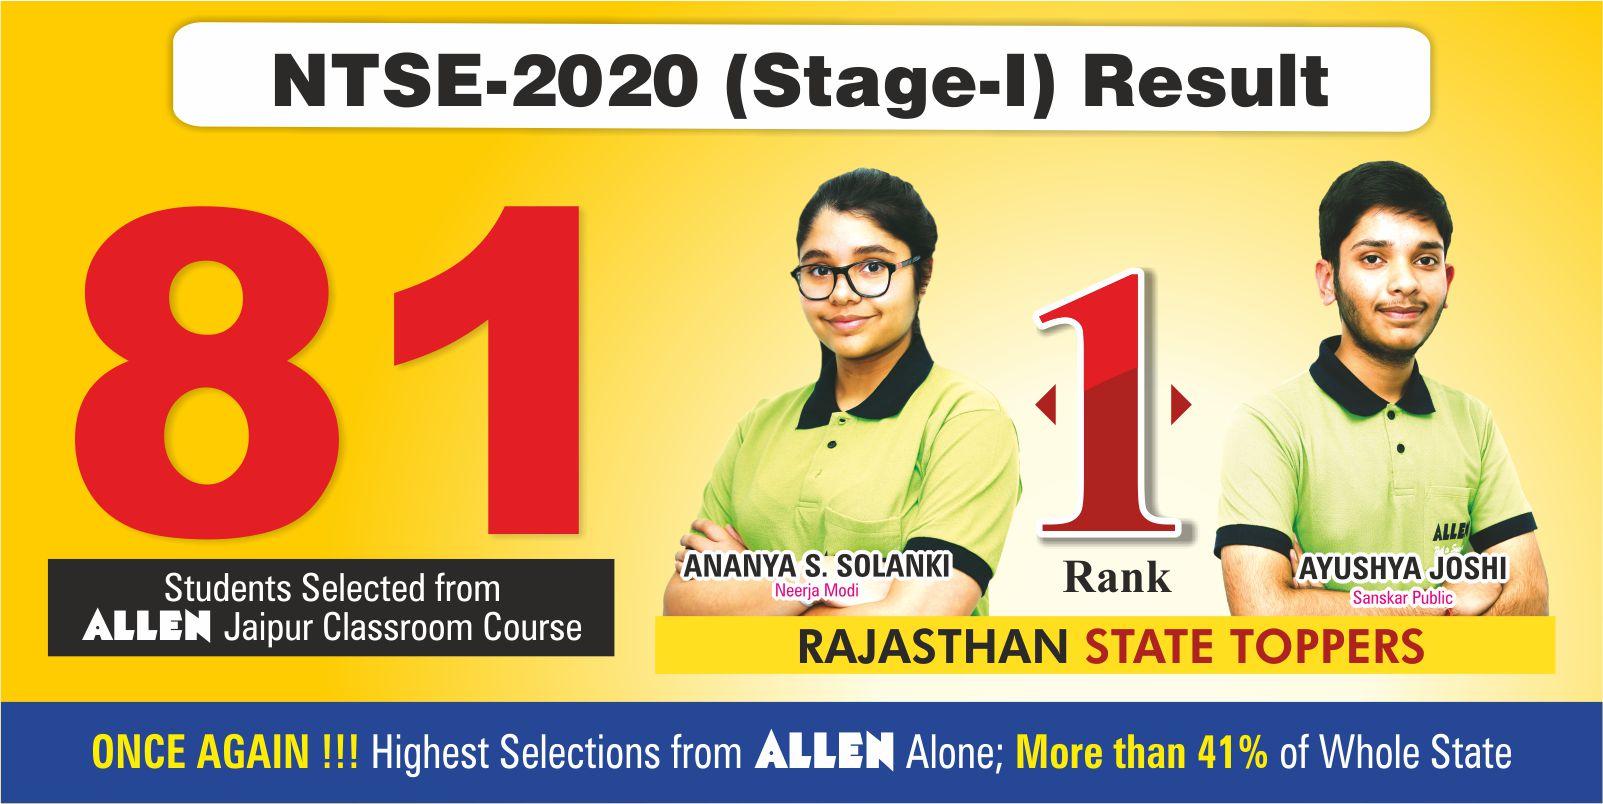 NTSE Stage-1 2020